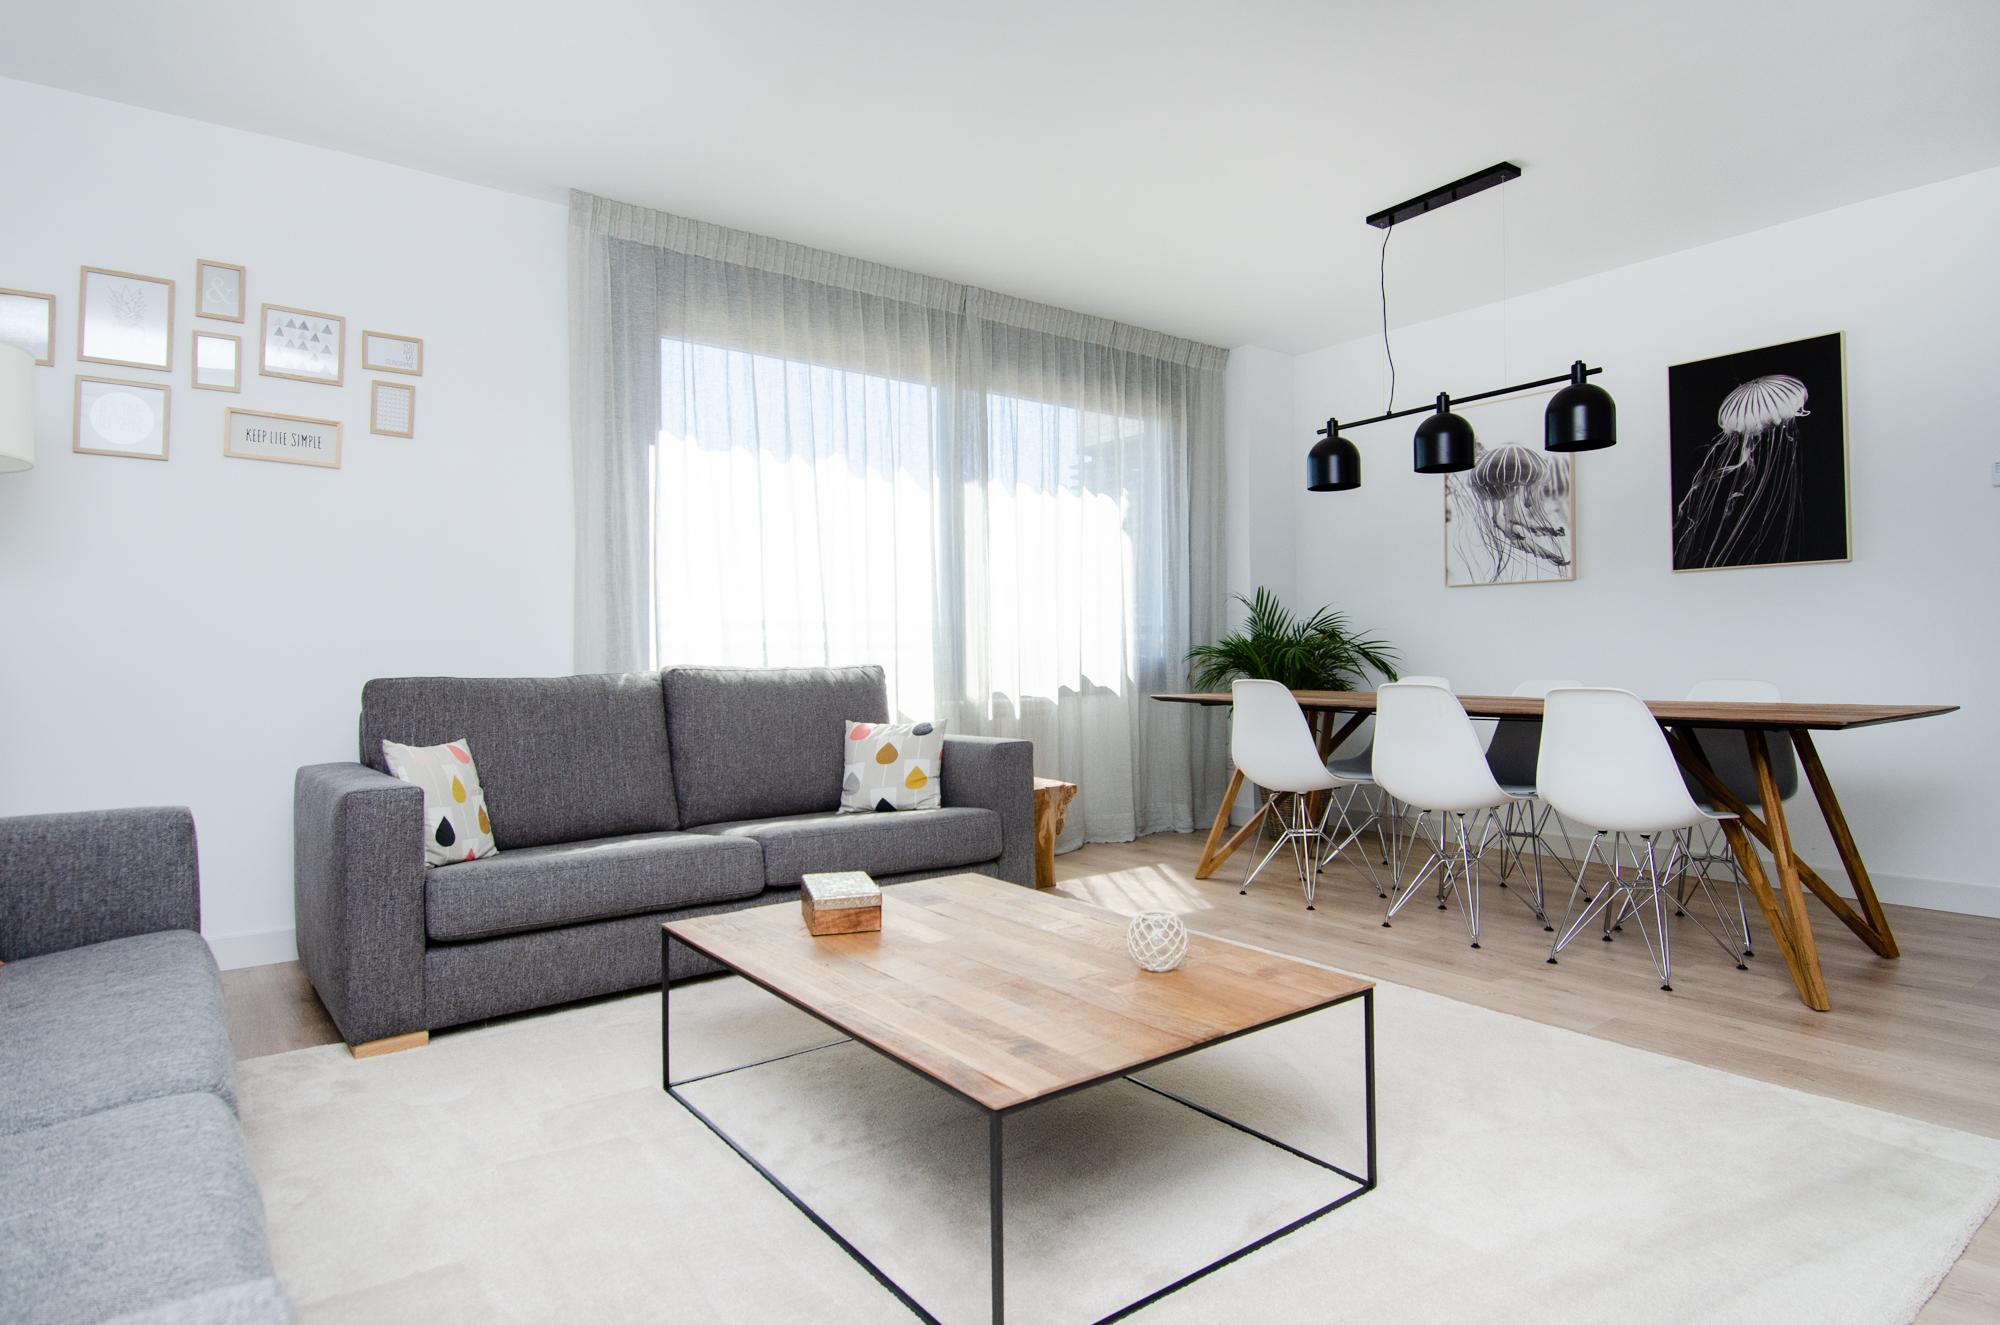 interiorismo-decoracion-ana-de-cabo-reforma-piso-santa-eugenia (12)